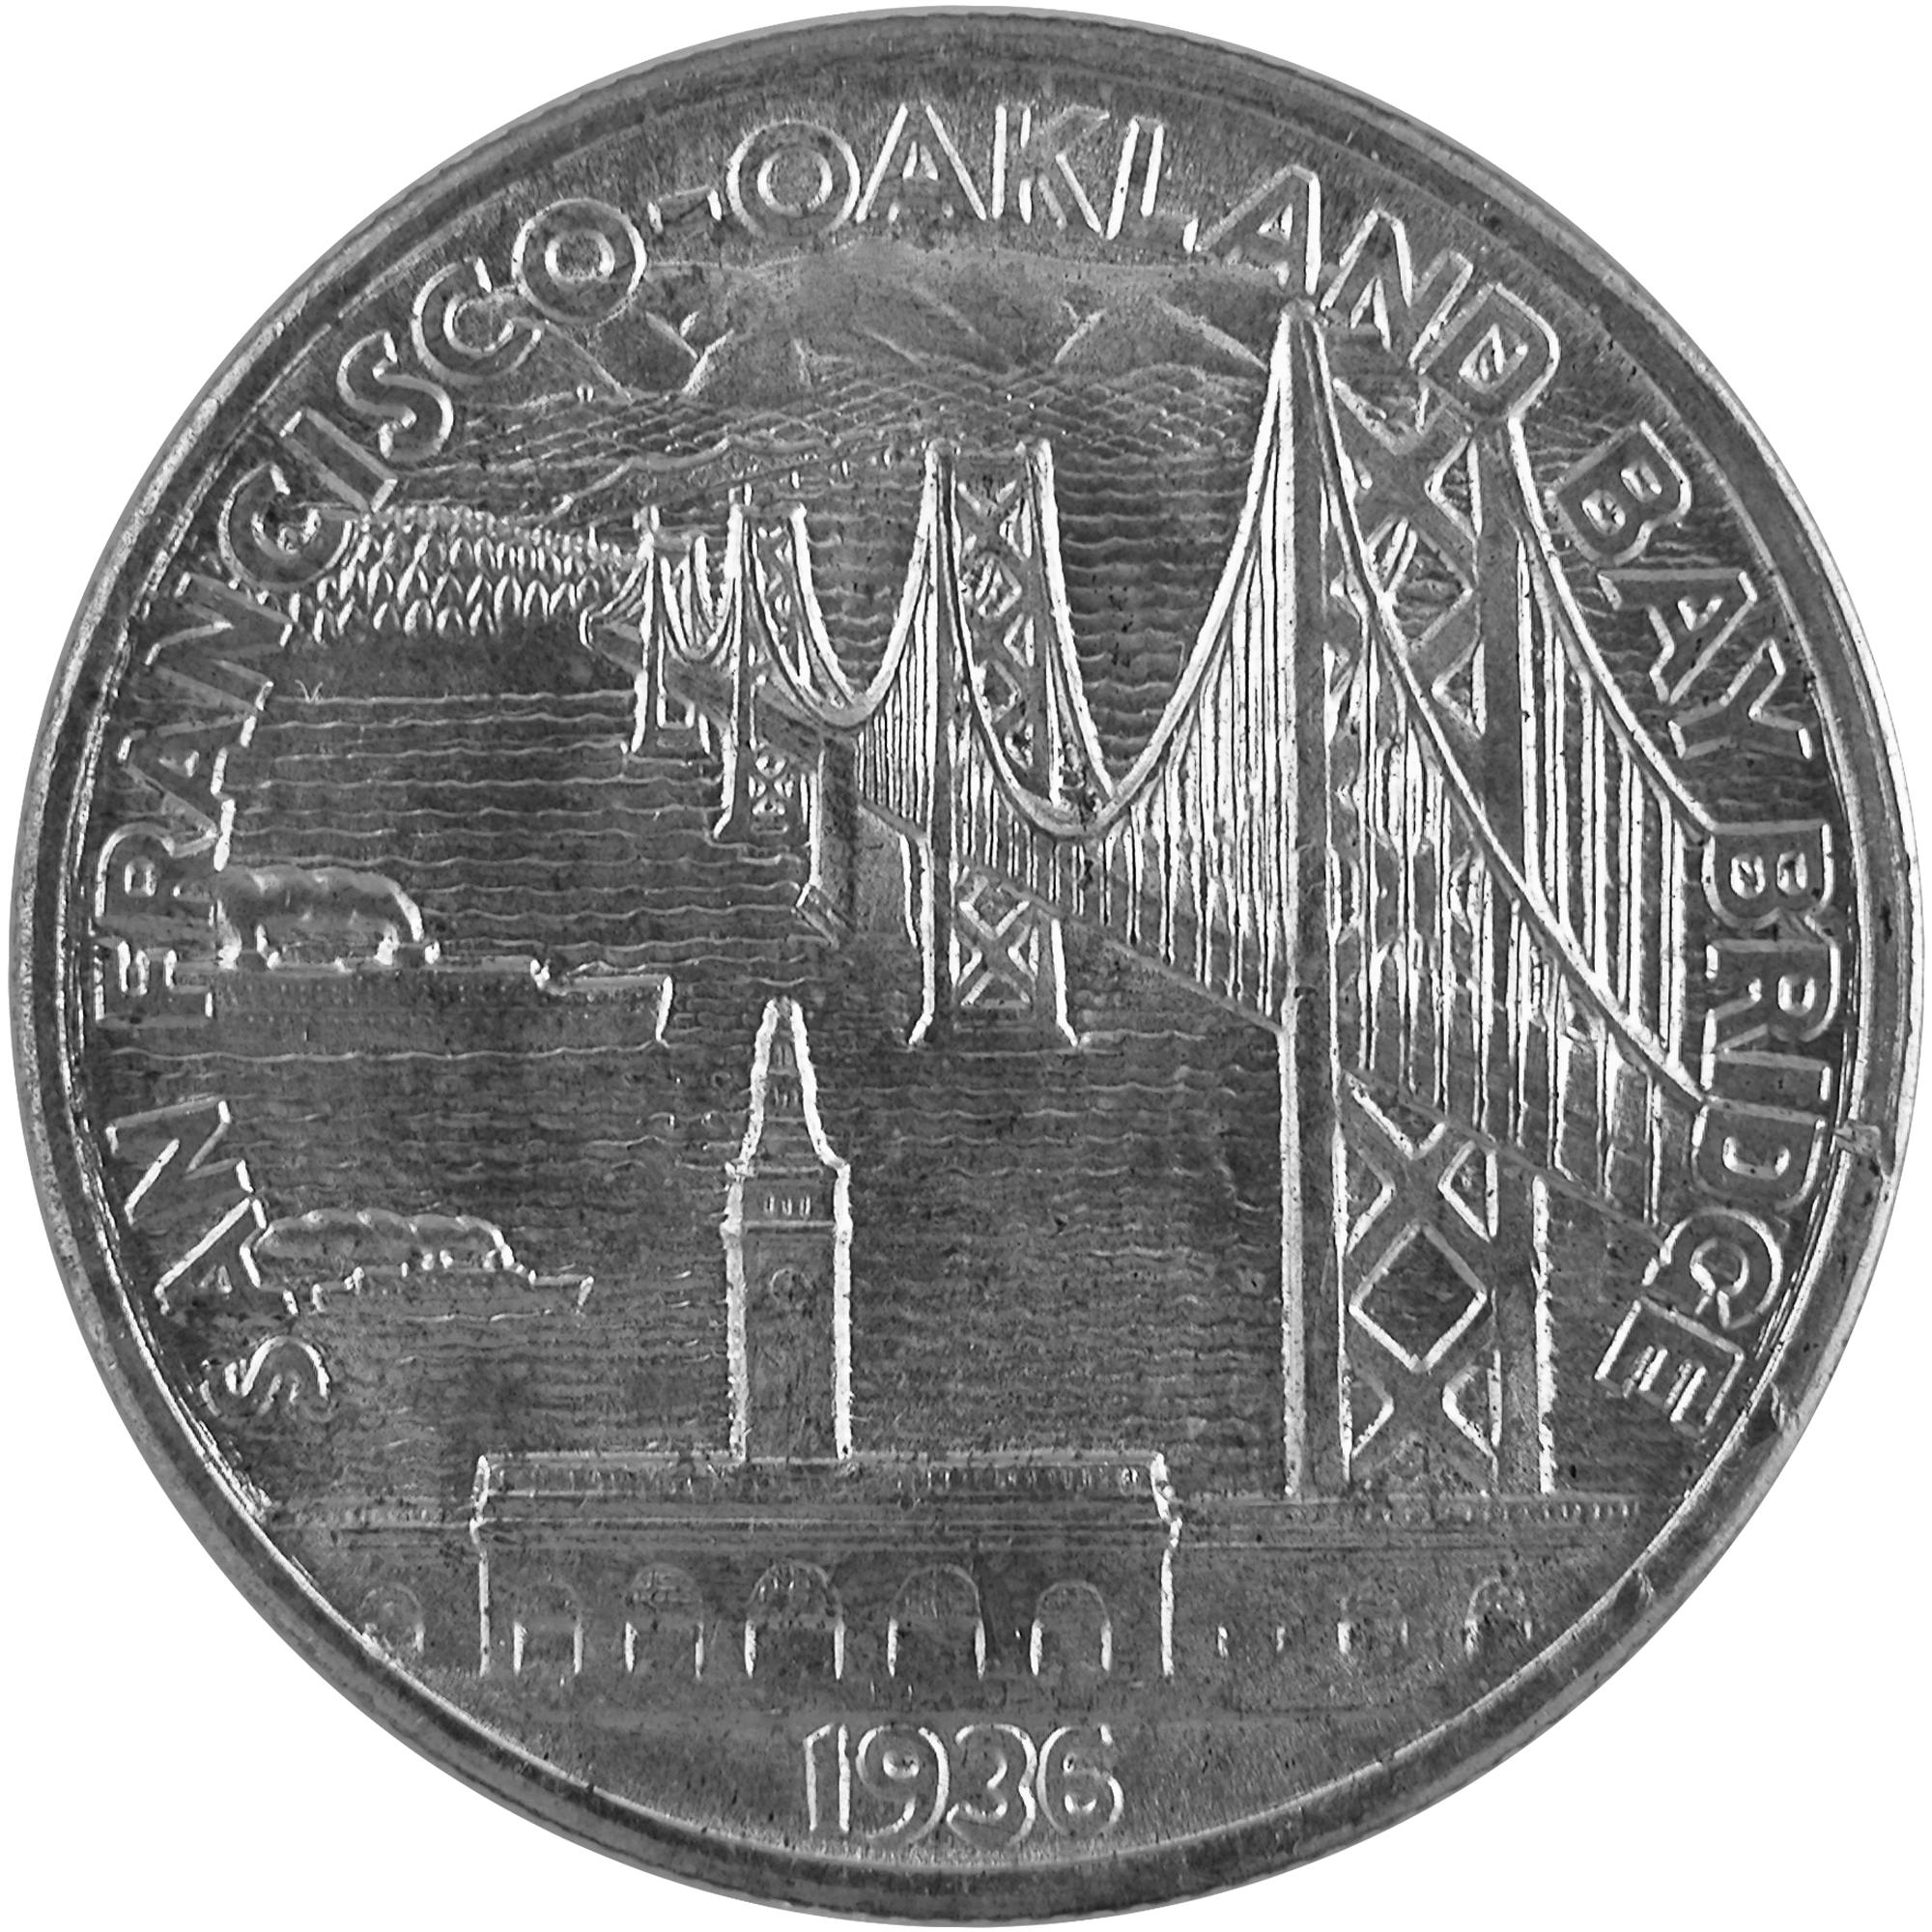 1936 Bay Bridge San Francisco Oakland Commemorative Silver Half Dollar Coin Reverse